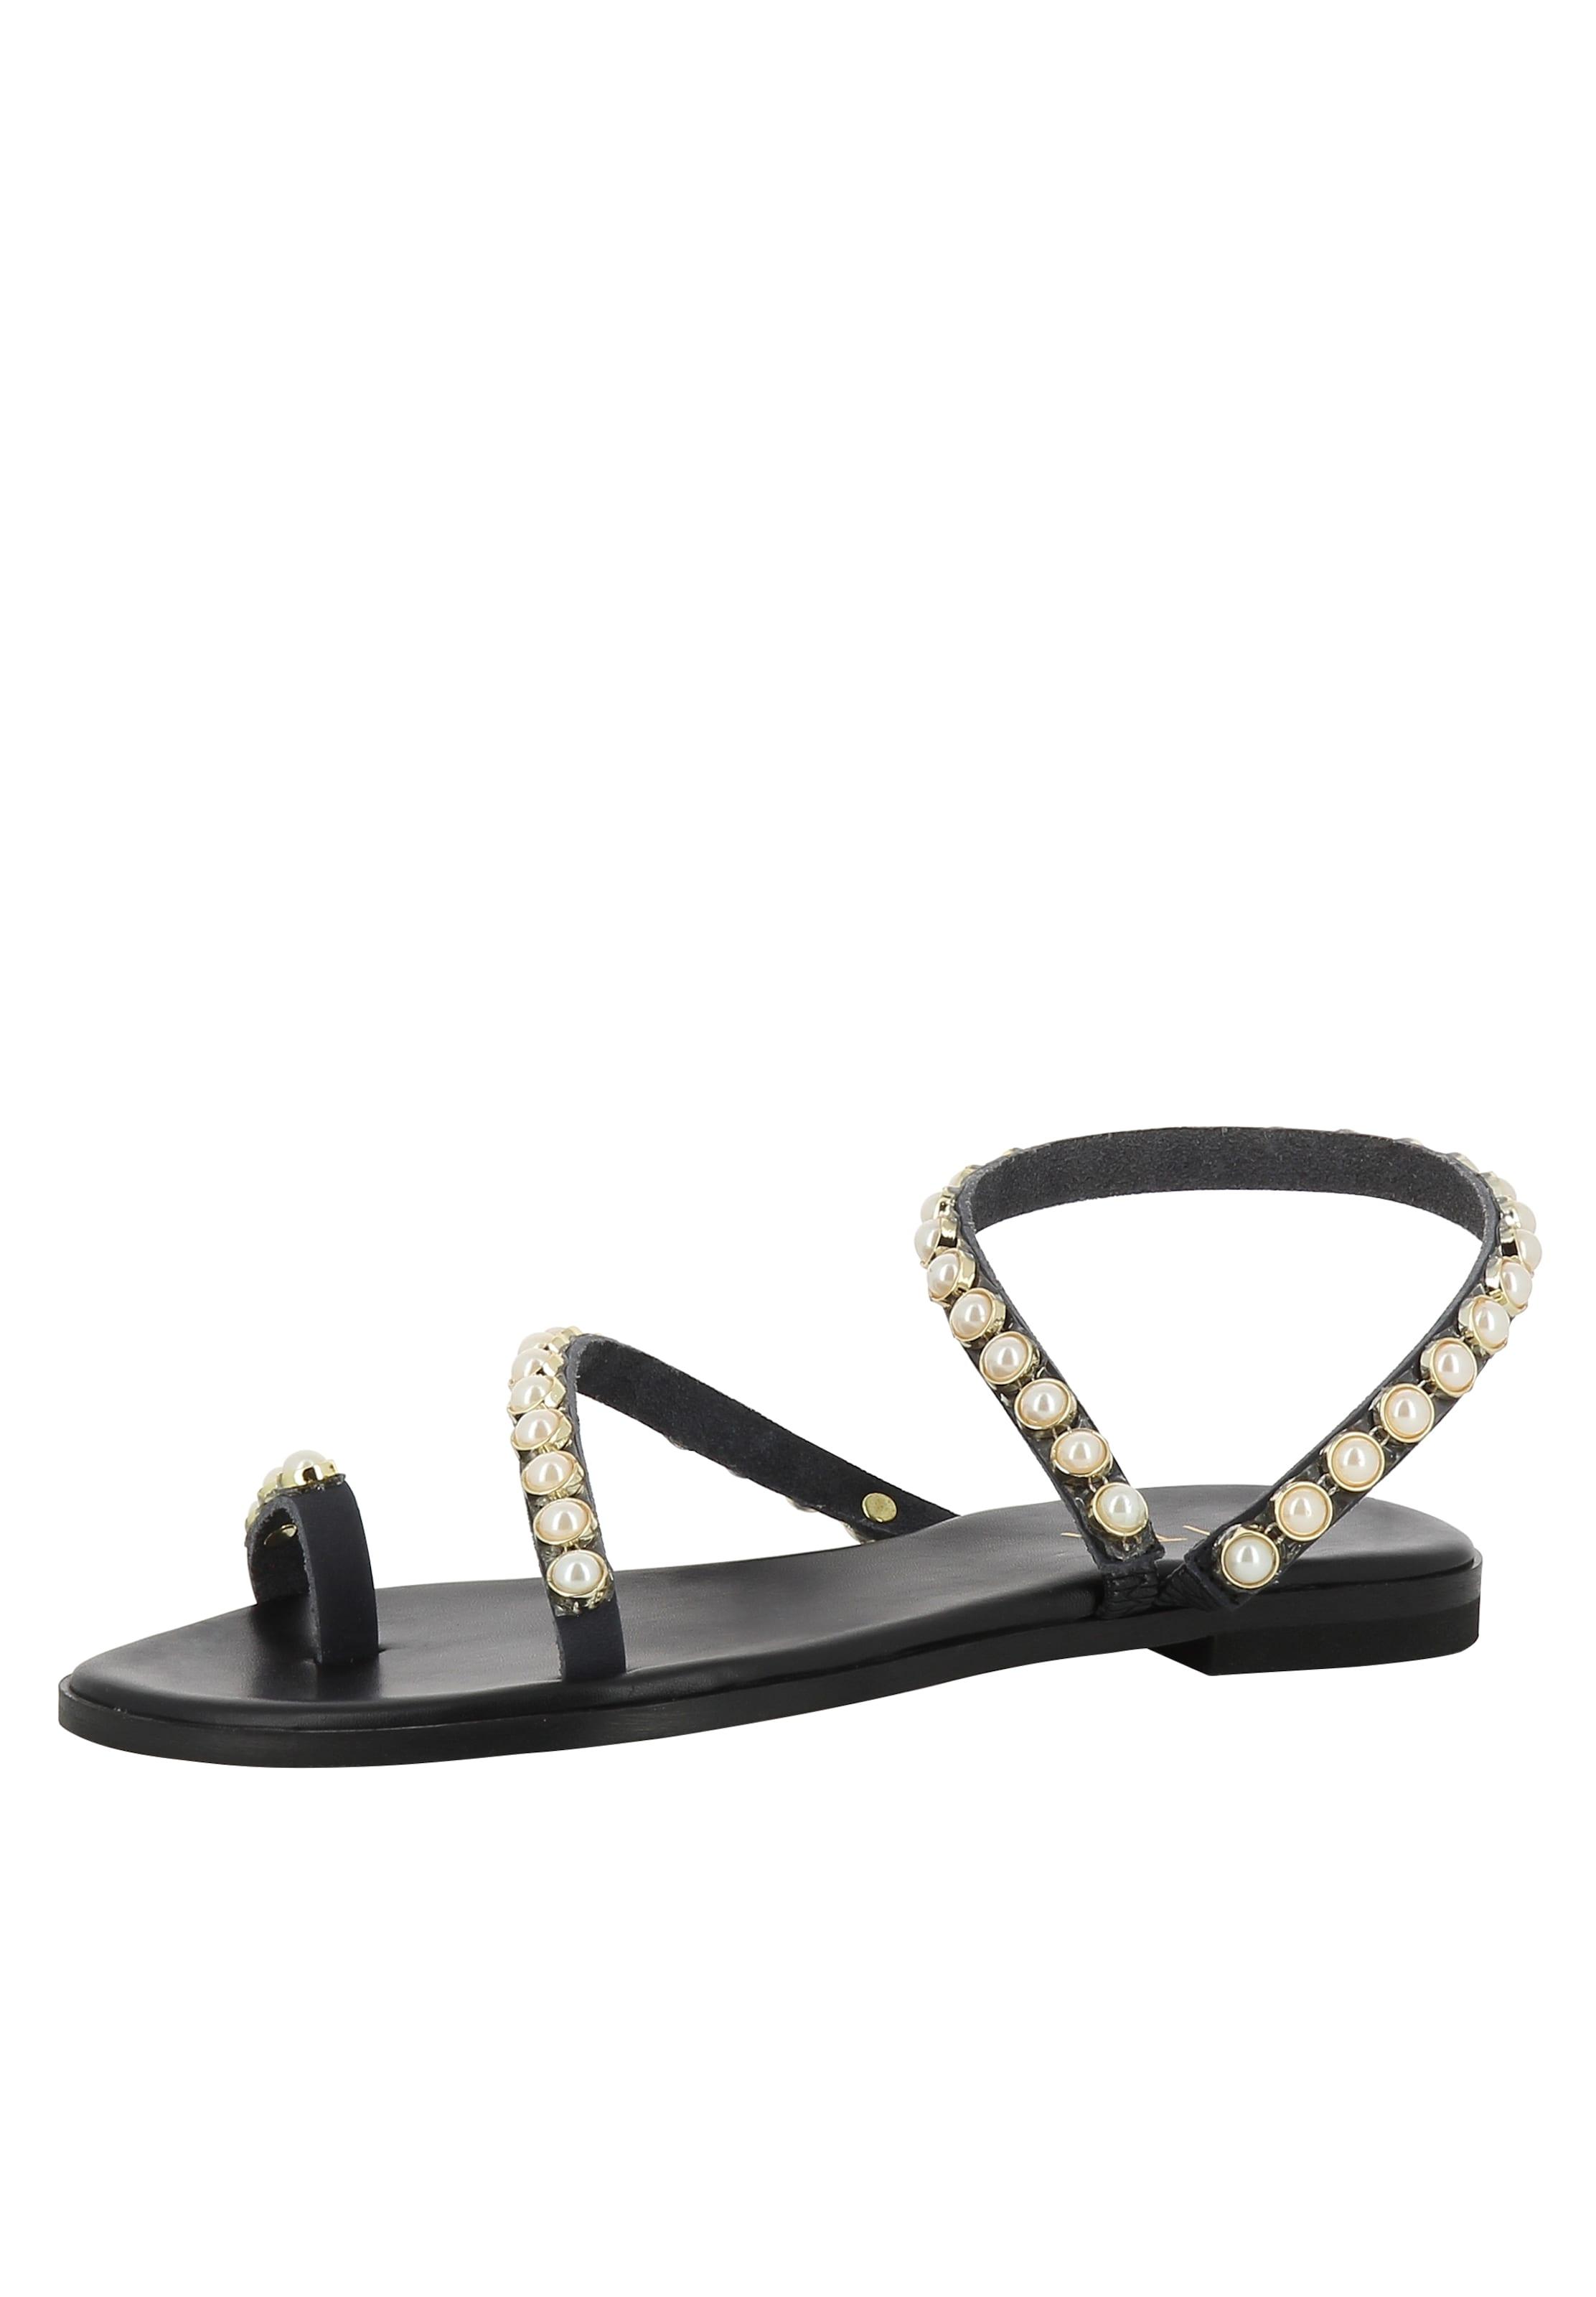 EVITA Schuhe Sandale OLIMPIA Verschleißfeste billige Schuhe EVITA 437826